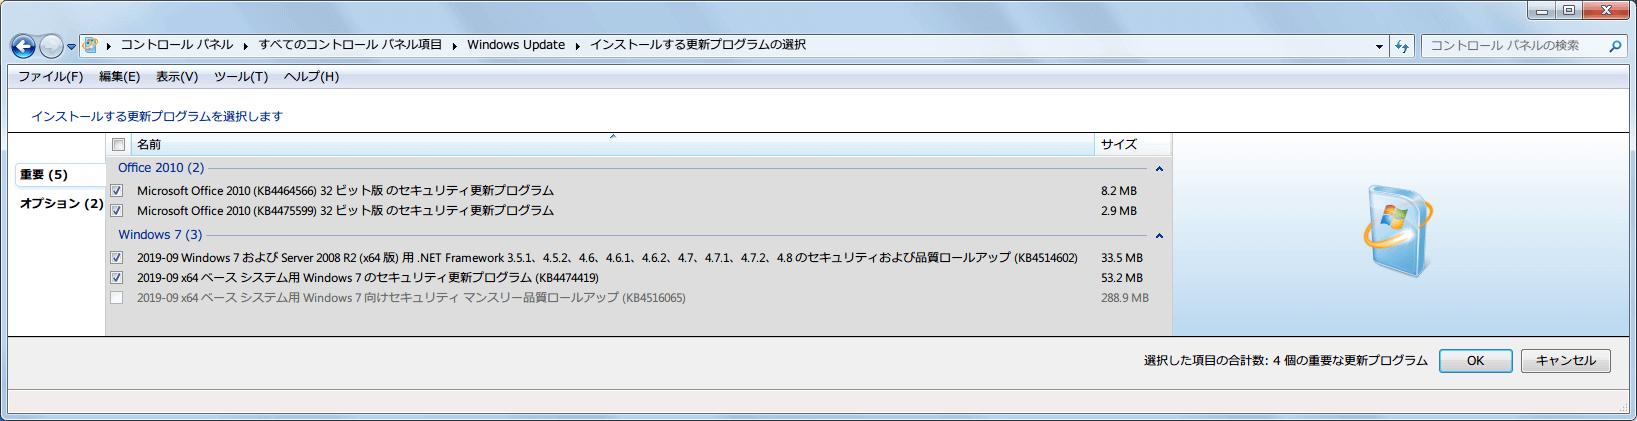 Windows 7 64bit Windows Update 重要 2019年9月分リスト KB4516065 非表示